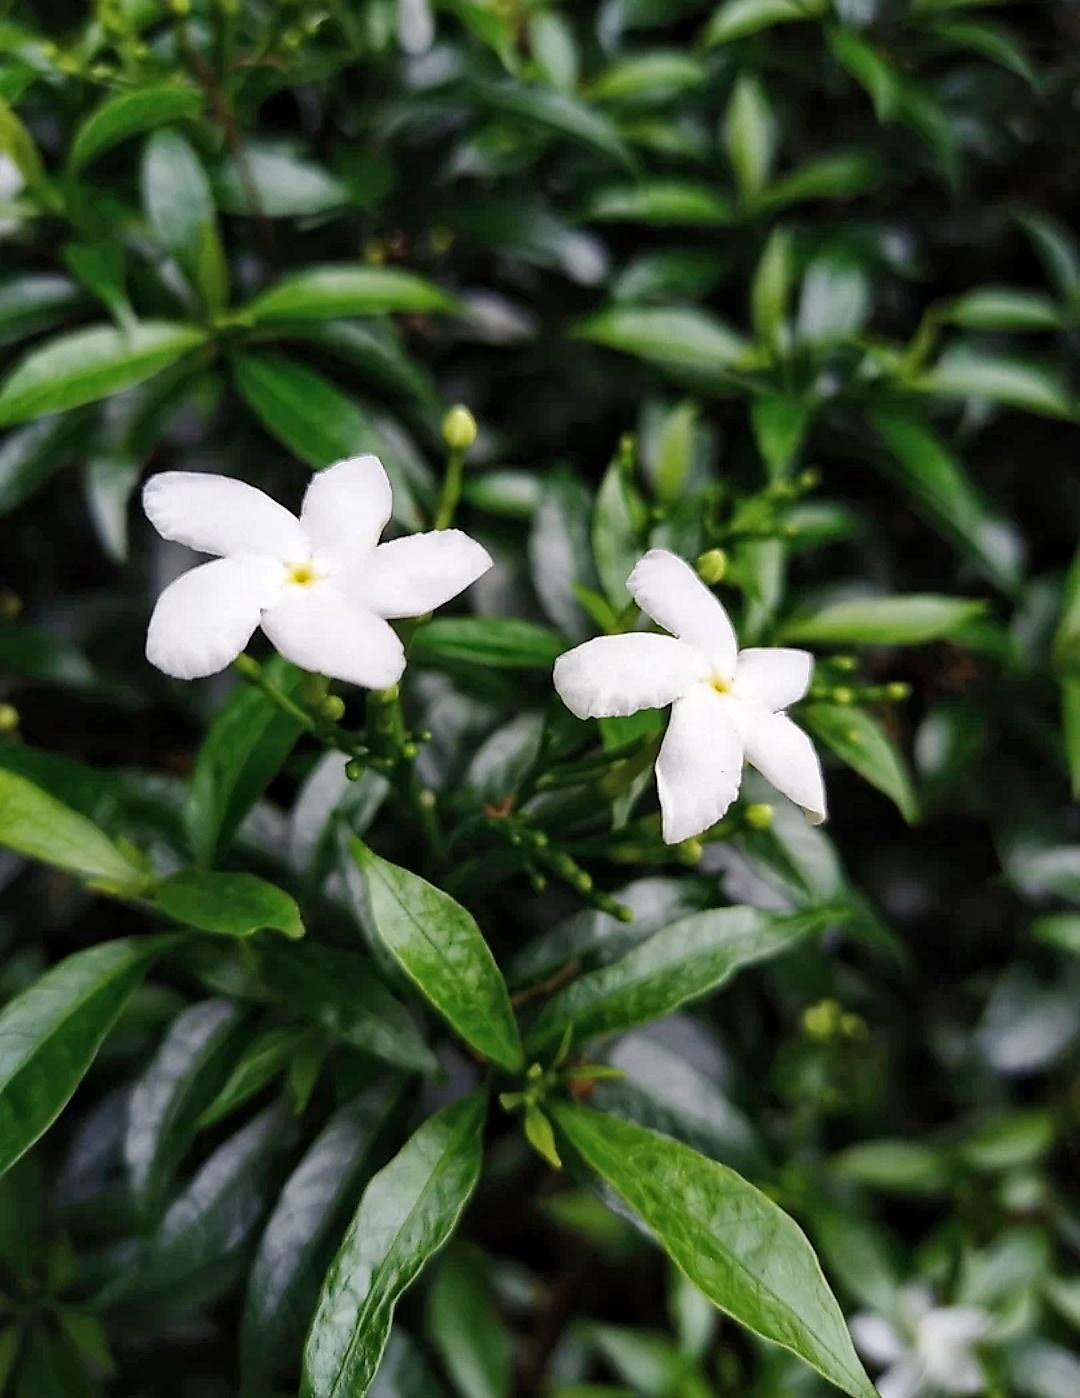 Five Petal White Flowers